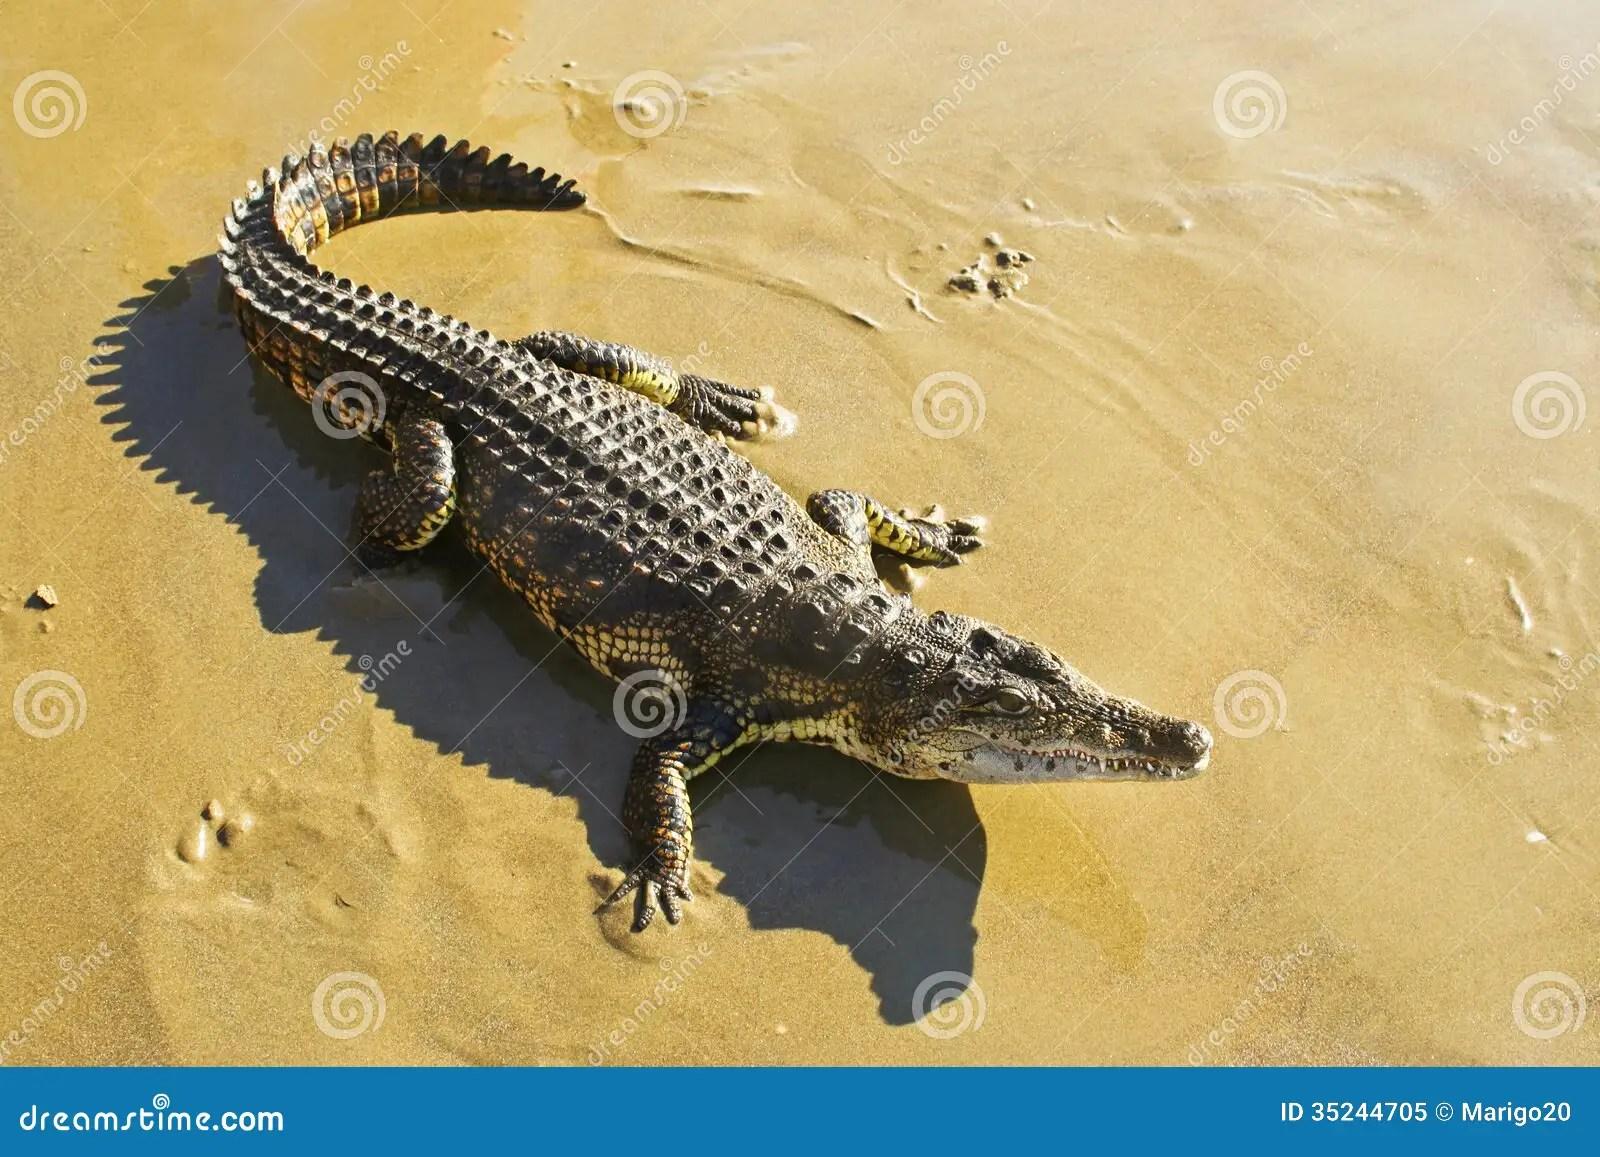 Wild Animal Crocodile Royalty Free Stock Photo